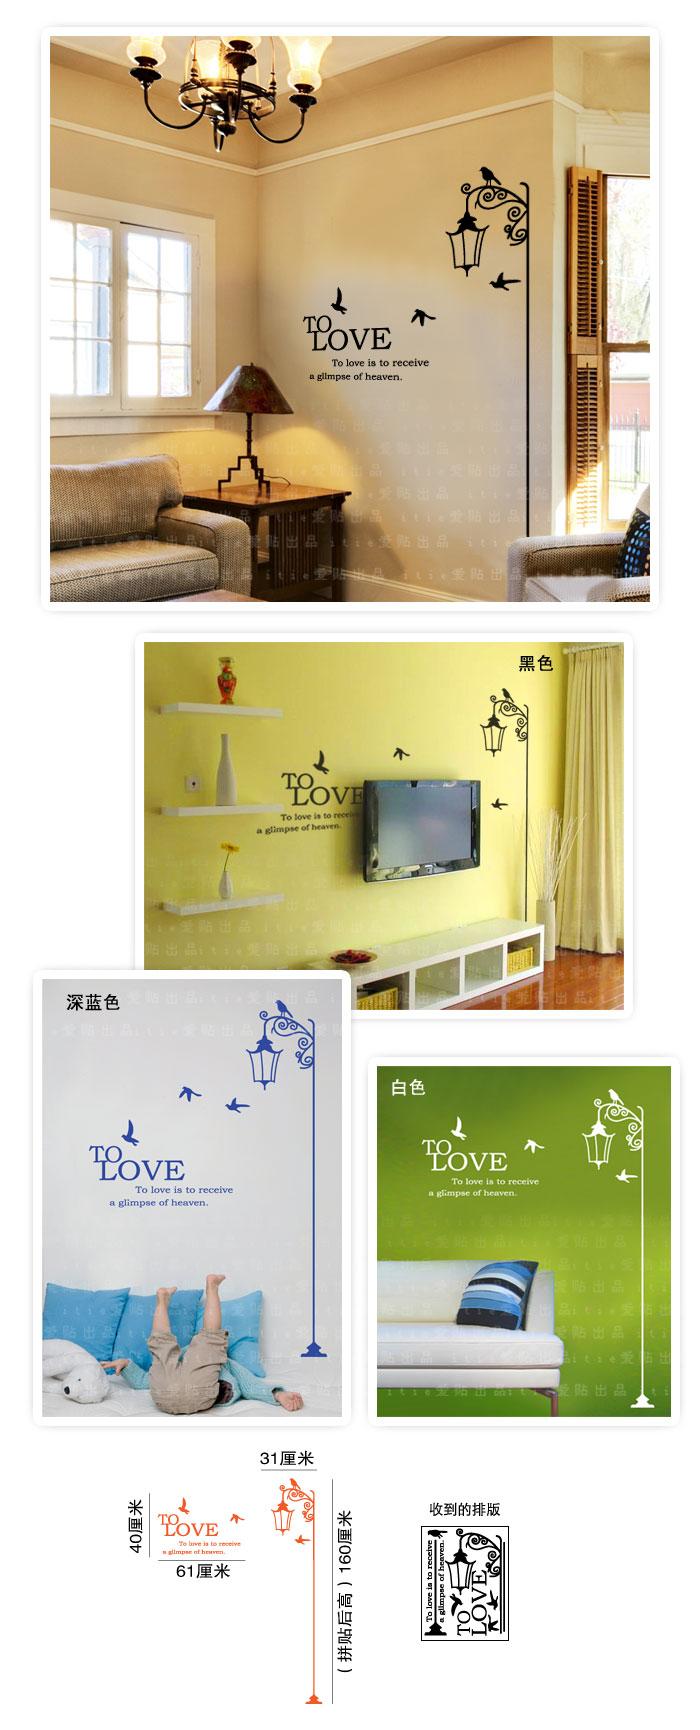 "itie love stickers ""beloved"" Wedding living room bedroom sofa LCD TV restaurant foyer wall stickers"